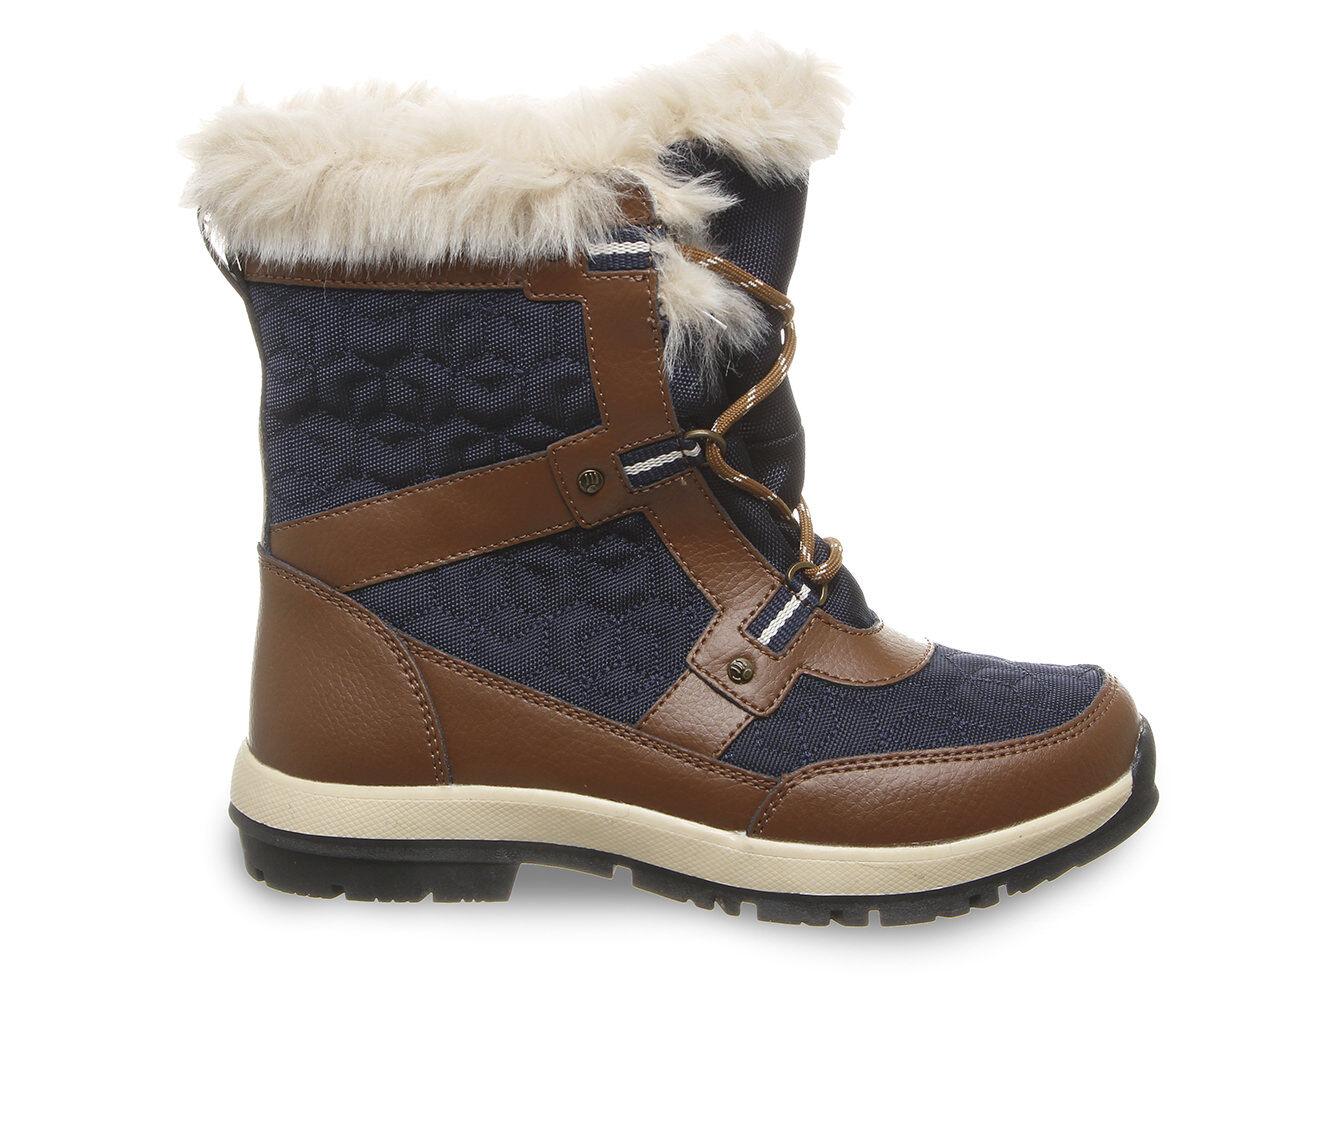 Women's Bearpaw Marina Winter Boots Hickory